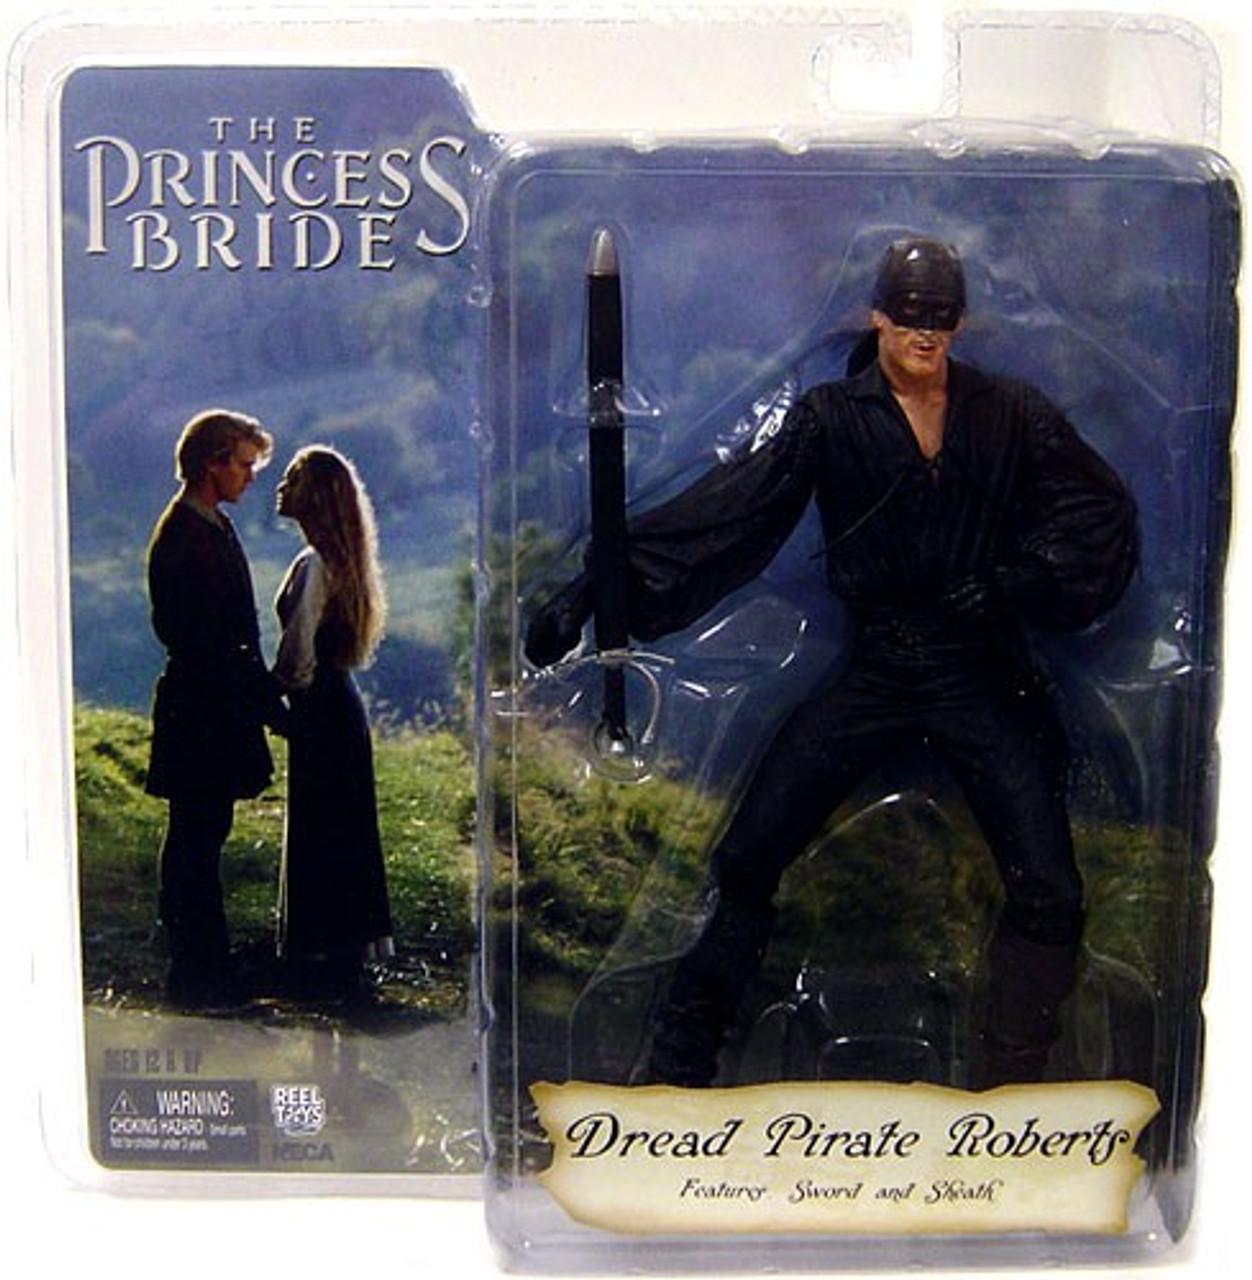 NECA The Princess Bride Dread Pirate Roberts Action Figure